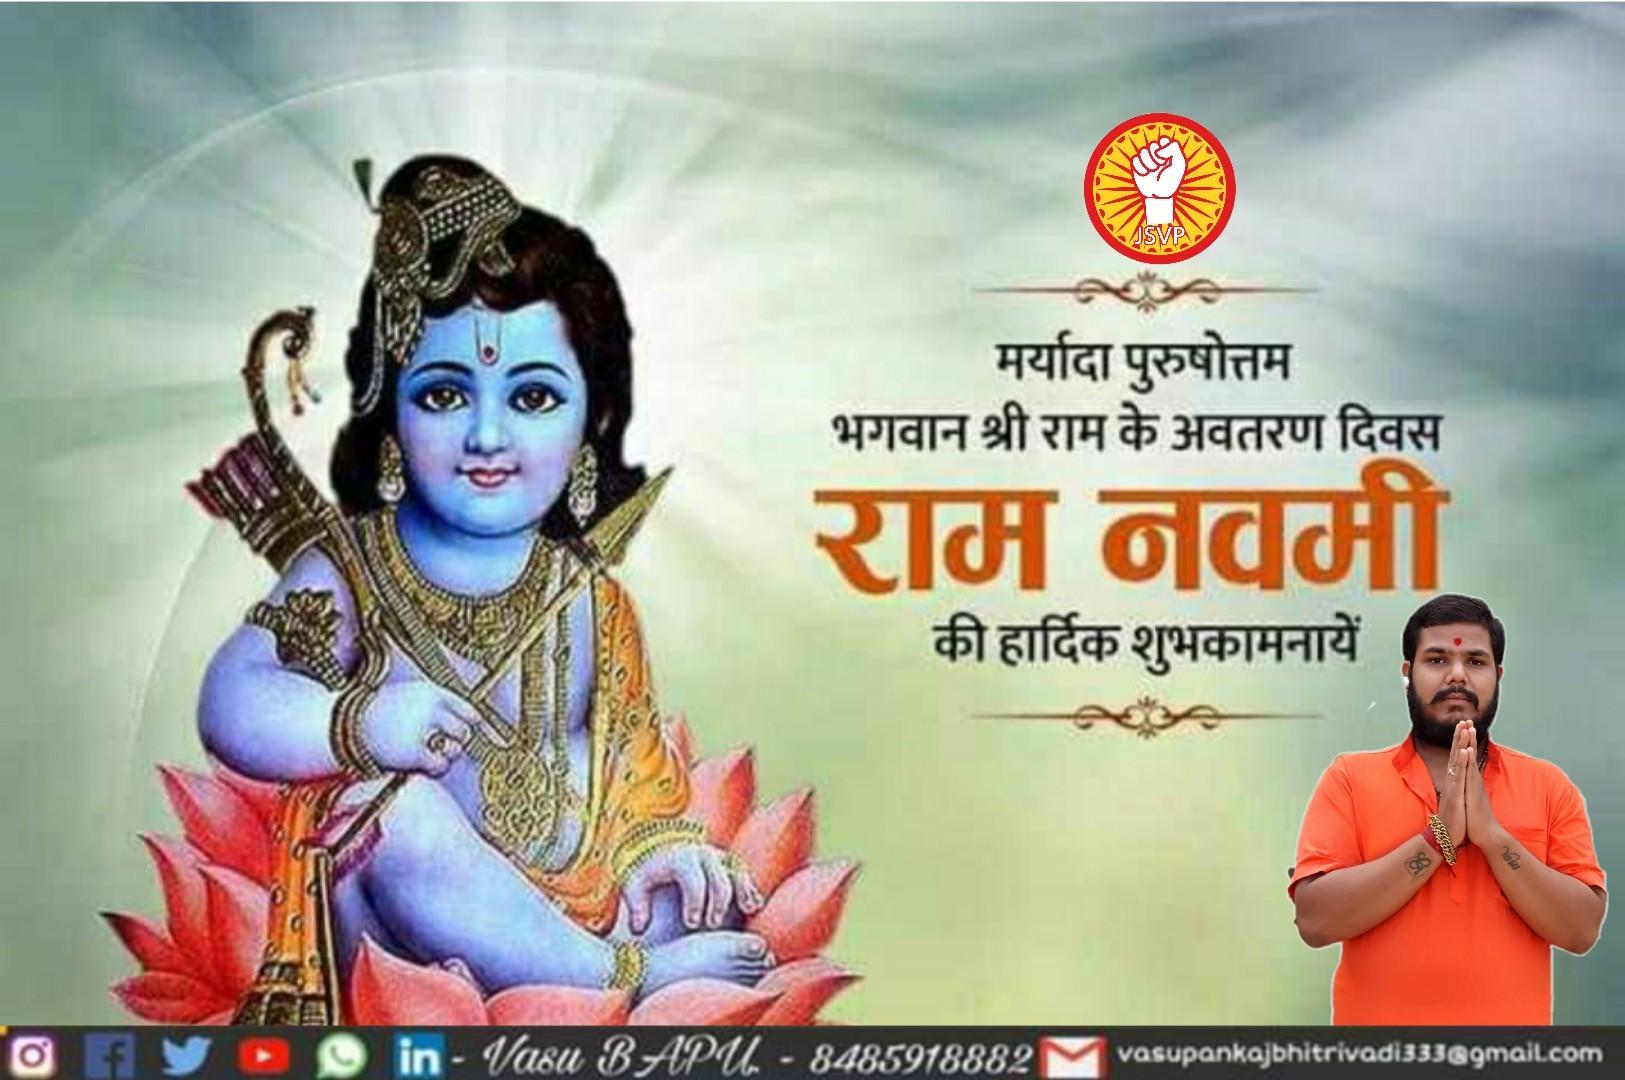 🙏राम नवमी - मर्यादा पुरुषोत्तम भगवान श्री राम के अवतरण दिवस राम नवमी की हार्दिक शुभकामनायें Date FM S in - Vasu BAPU . - 8485918882 Mvasupankajbhitrivadi333 @ gmail . com - ShareChat